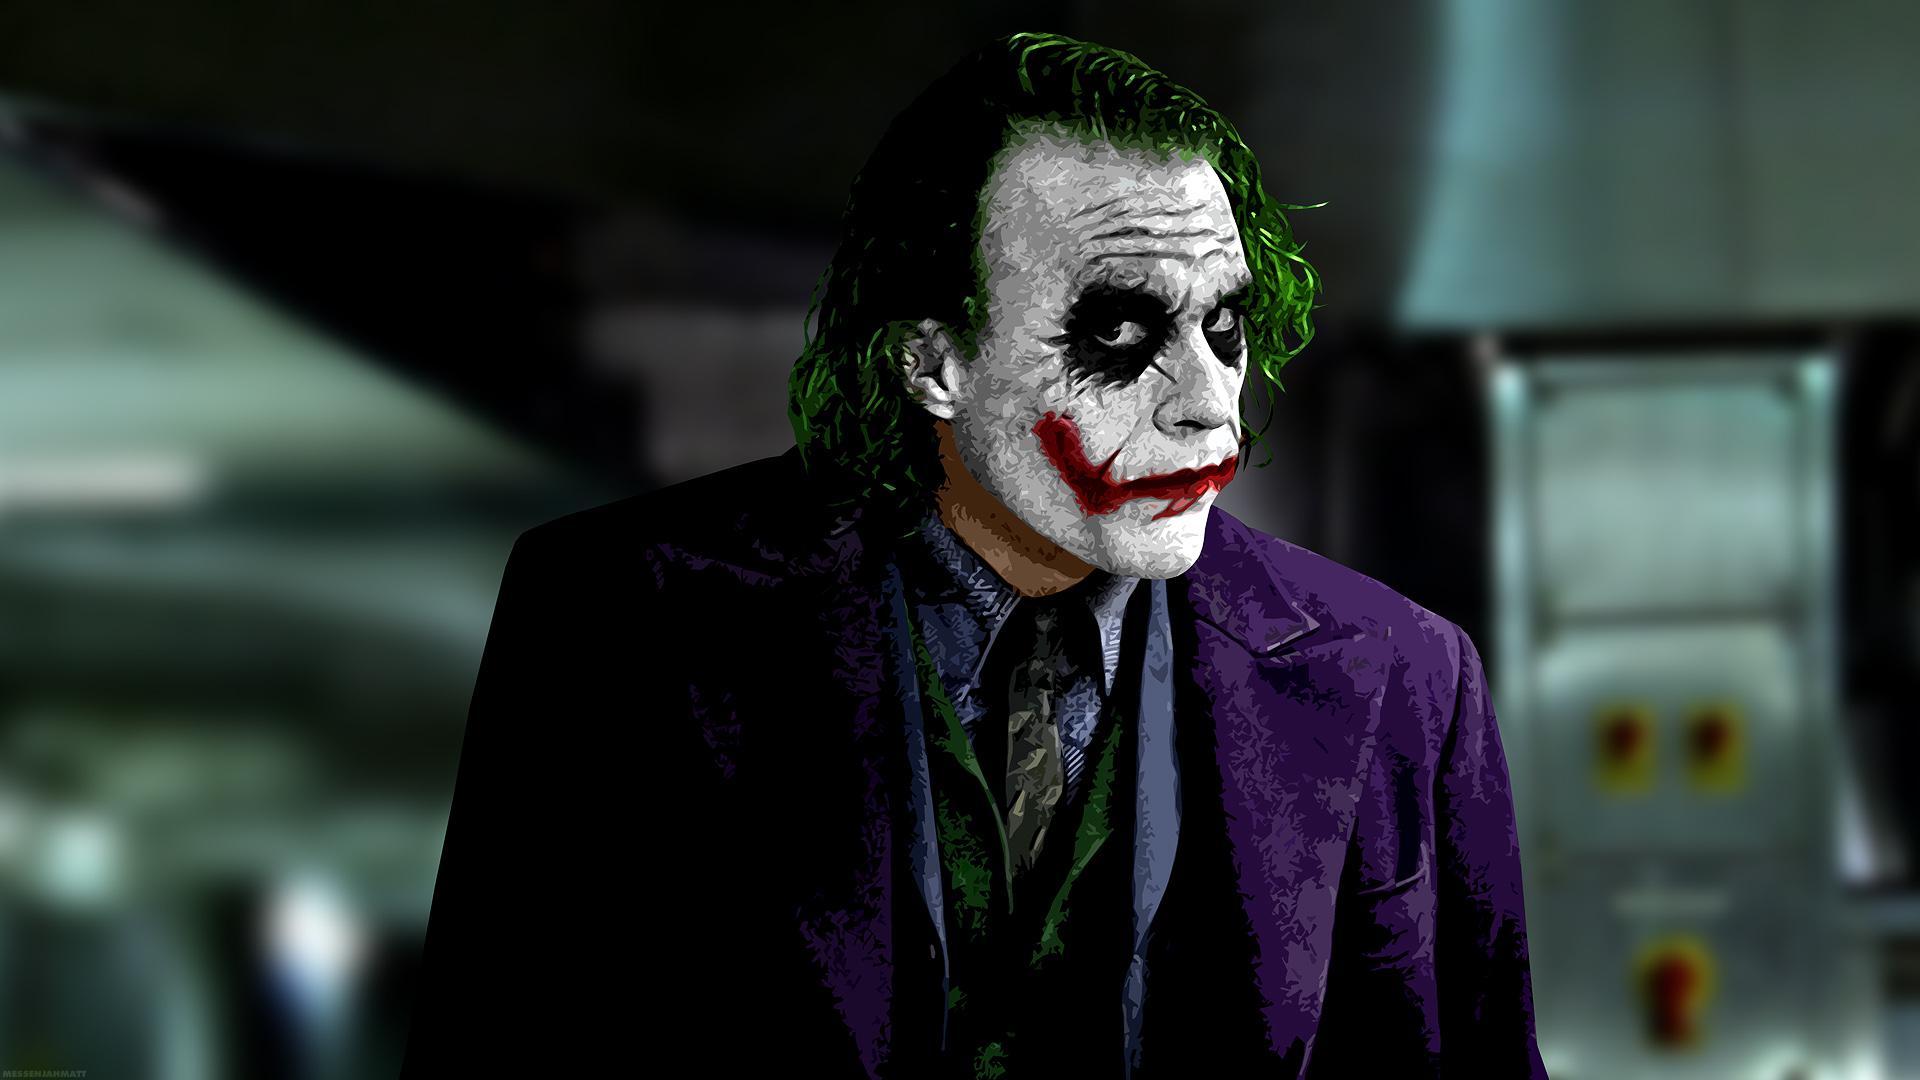 joker   The Joker Wallpaper 28092803 1920x1080